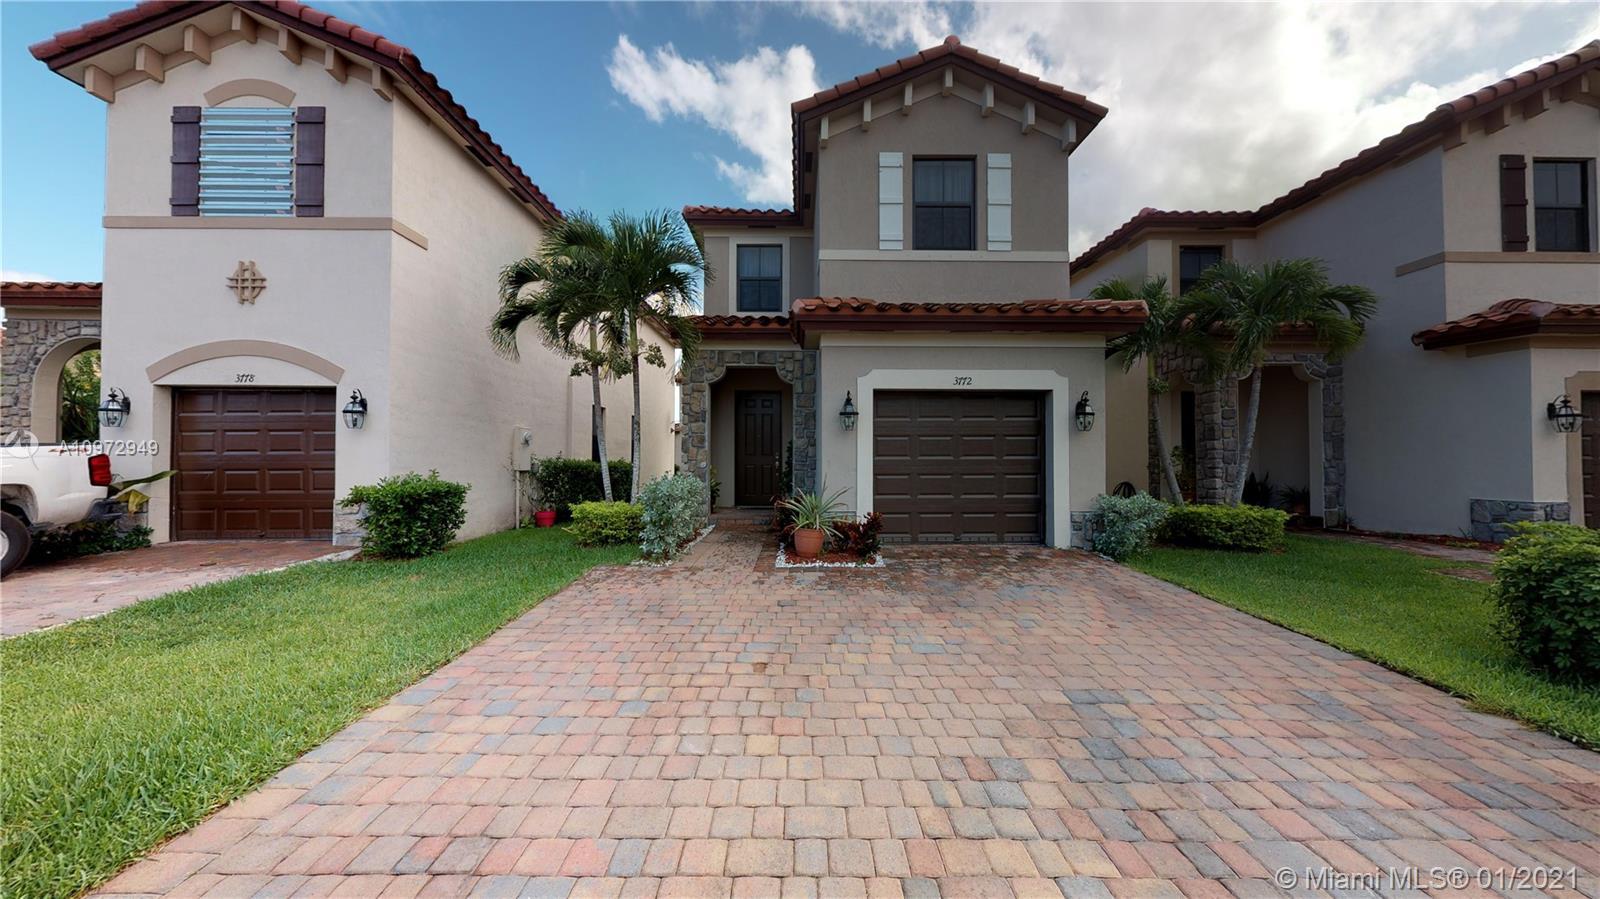 3772 NE 2nd St Property Photo - Homestead, FL real estate listing